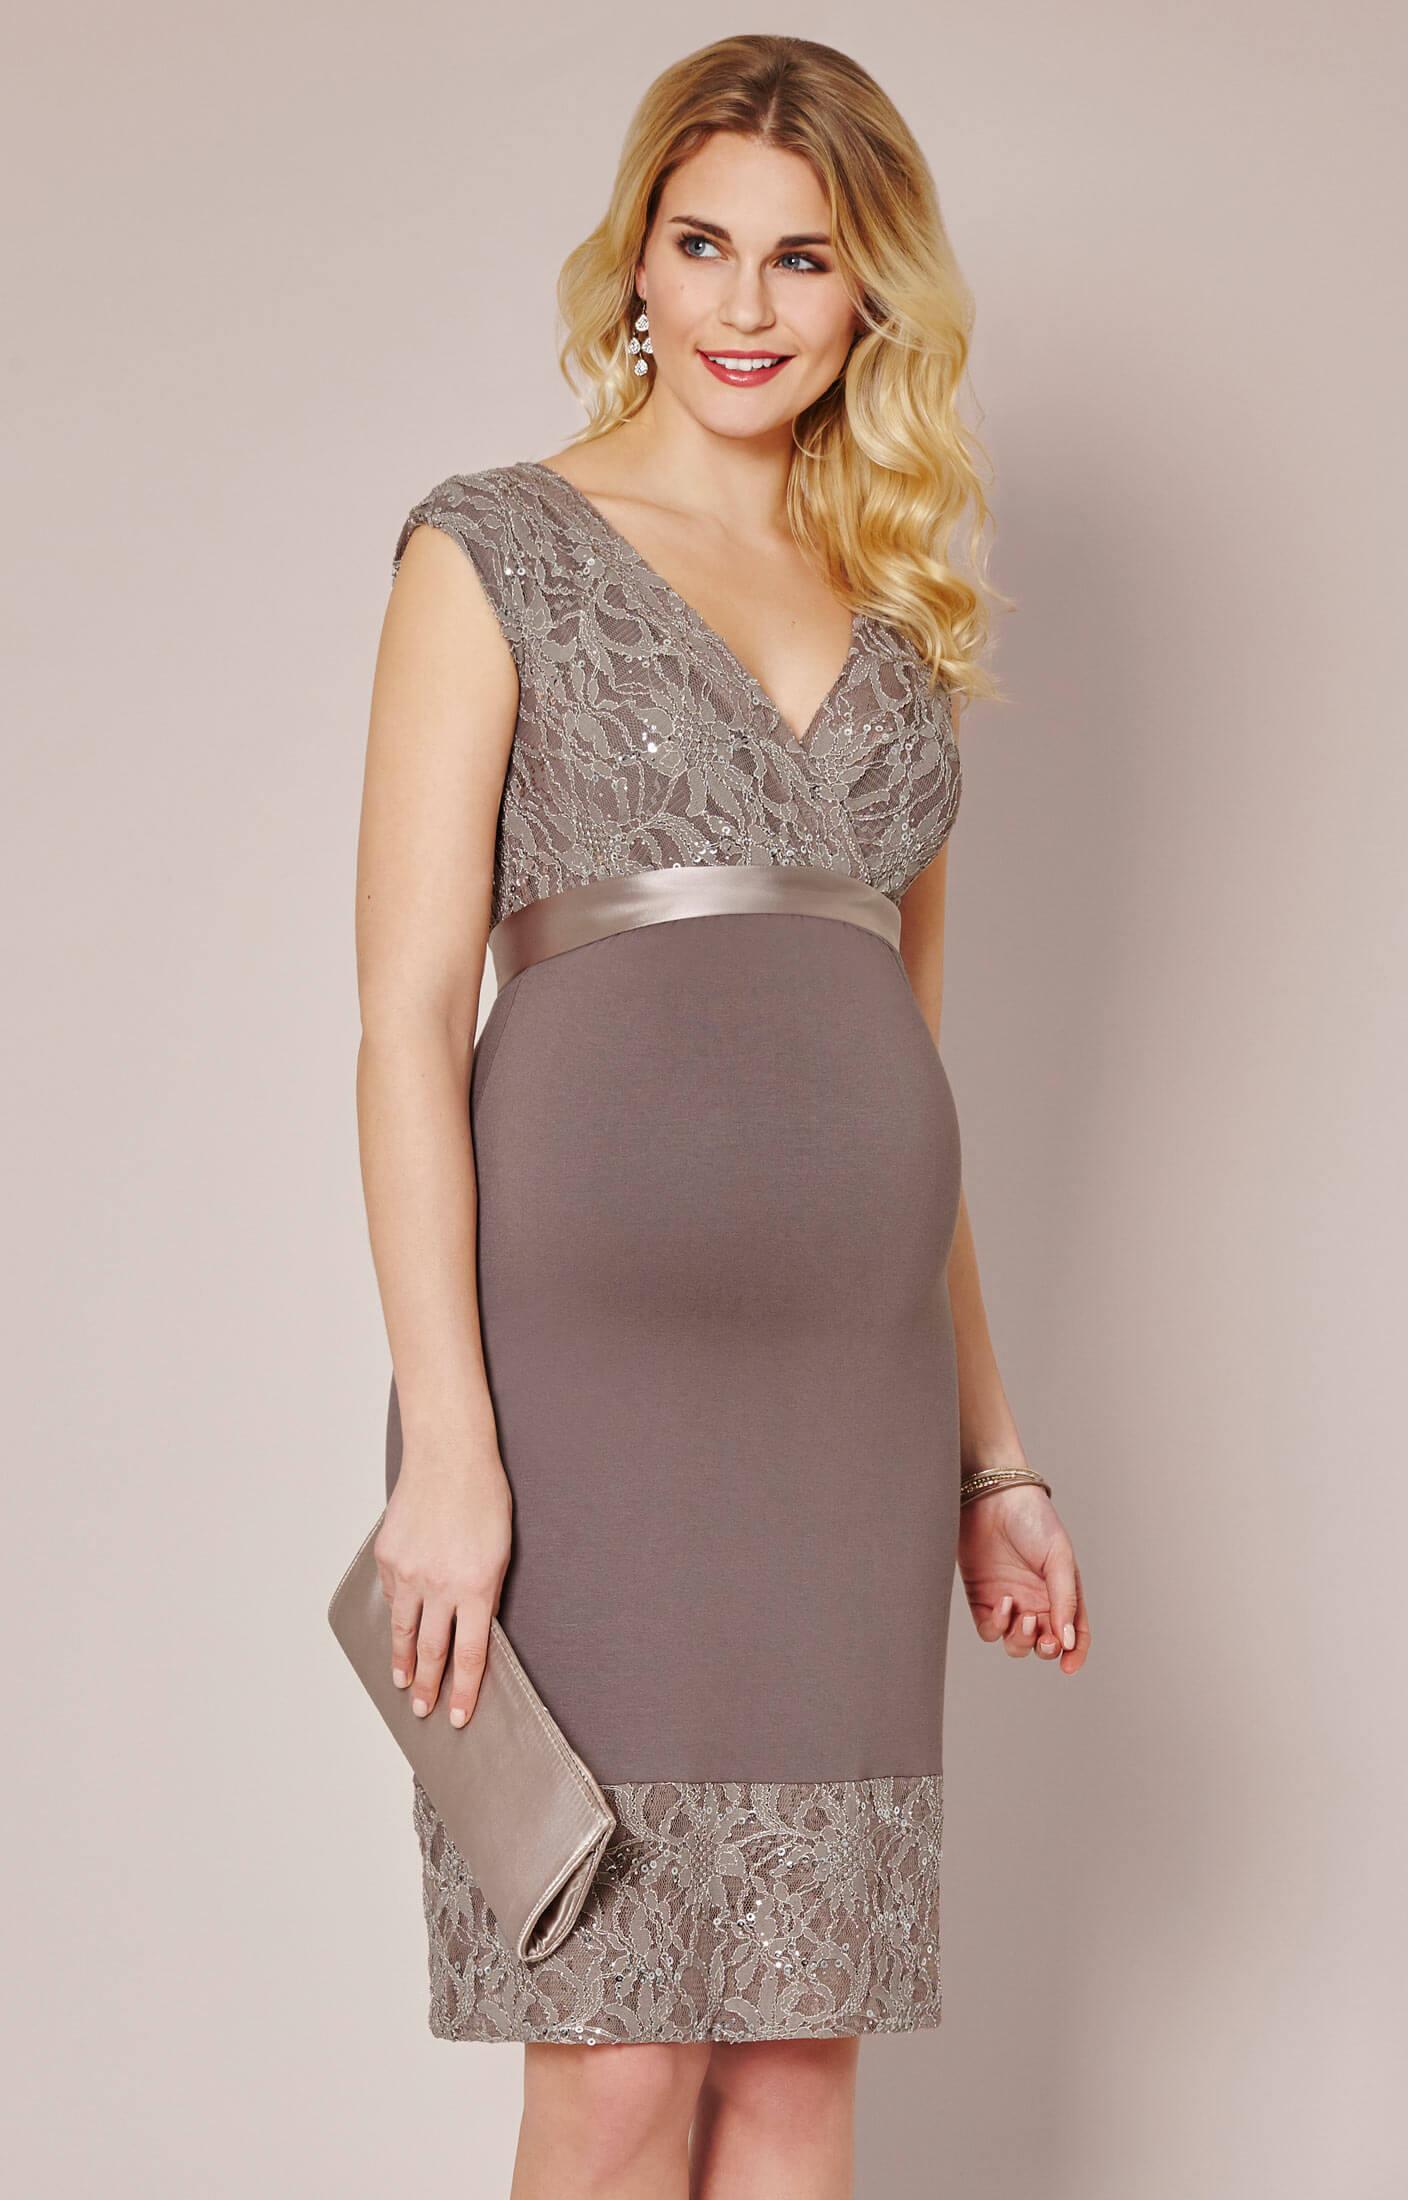 Formal maternity dresses for weddings wedding ideas twilight lace maternity dress mocha wedding dresses ombrellifo Gallery